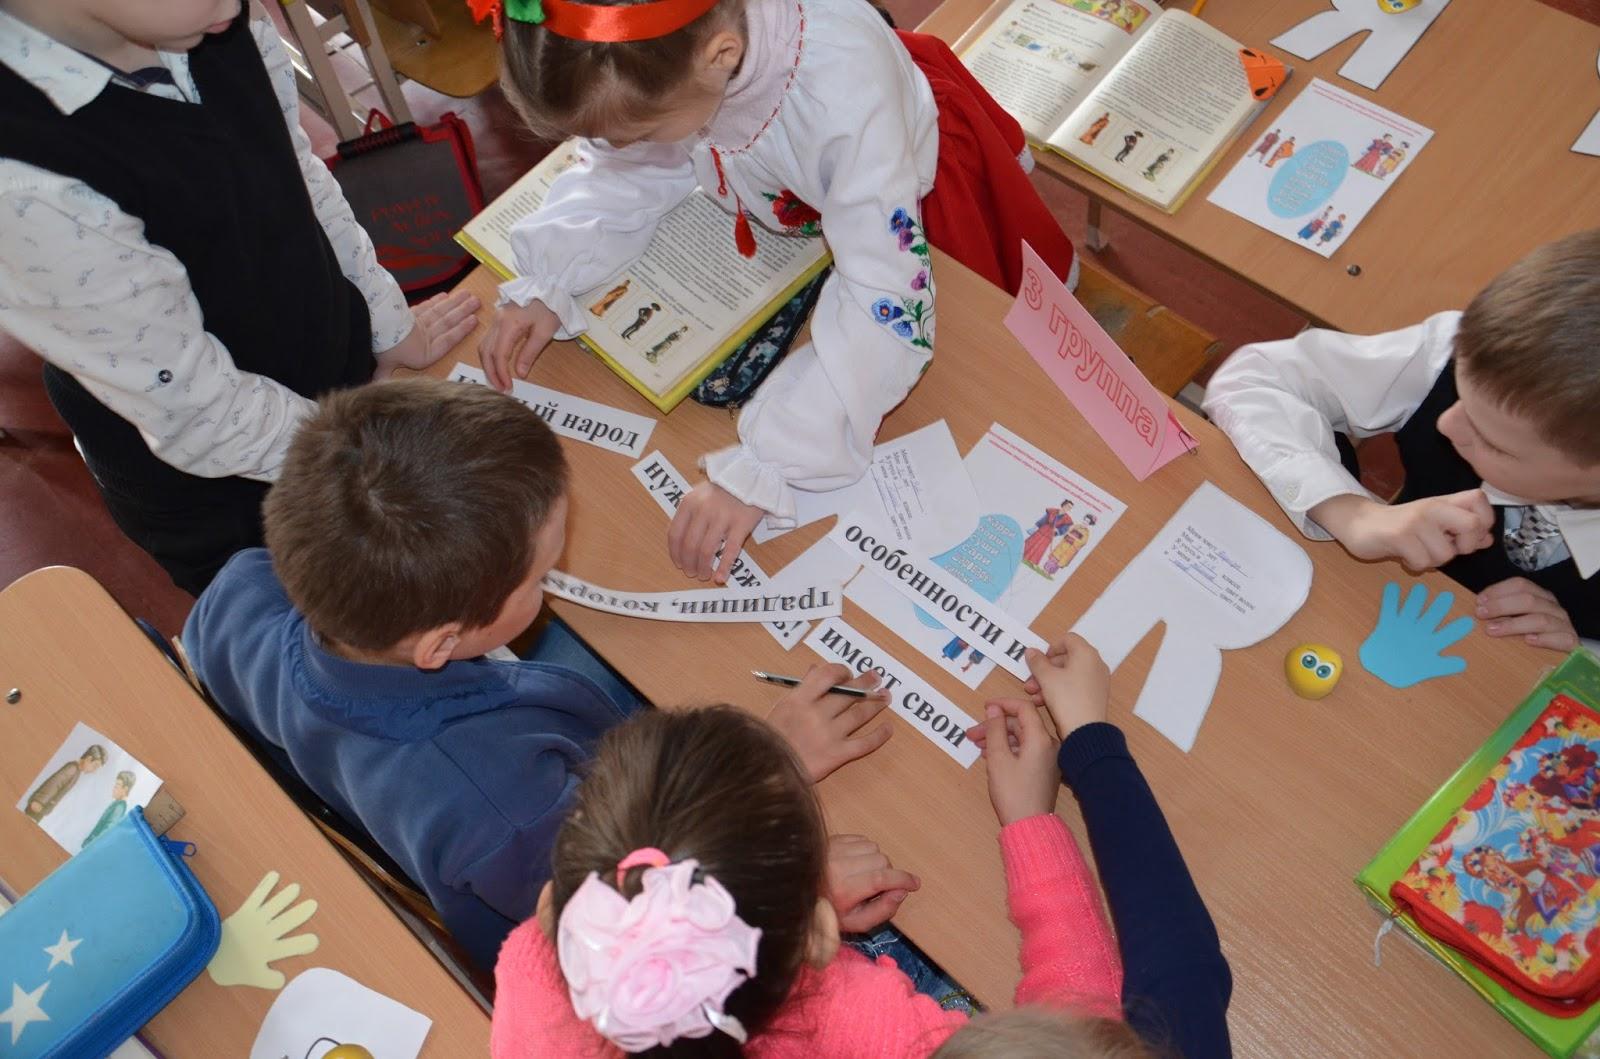 Диктанты по русскому языку 4 класс лесная опушка за декабрь 2017 начало из-за леса